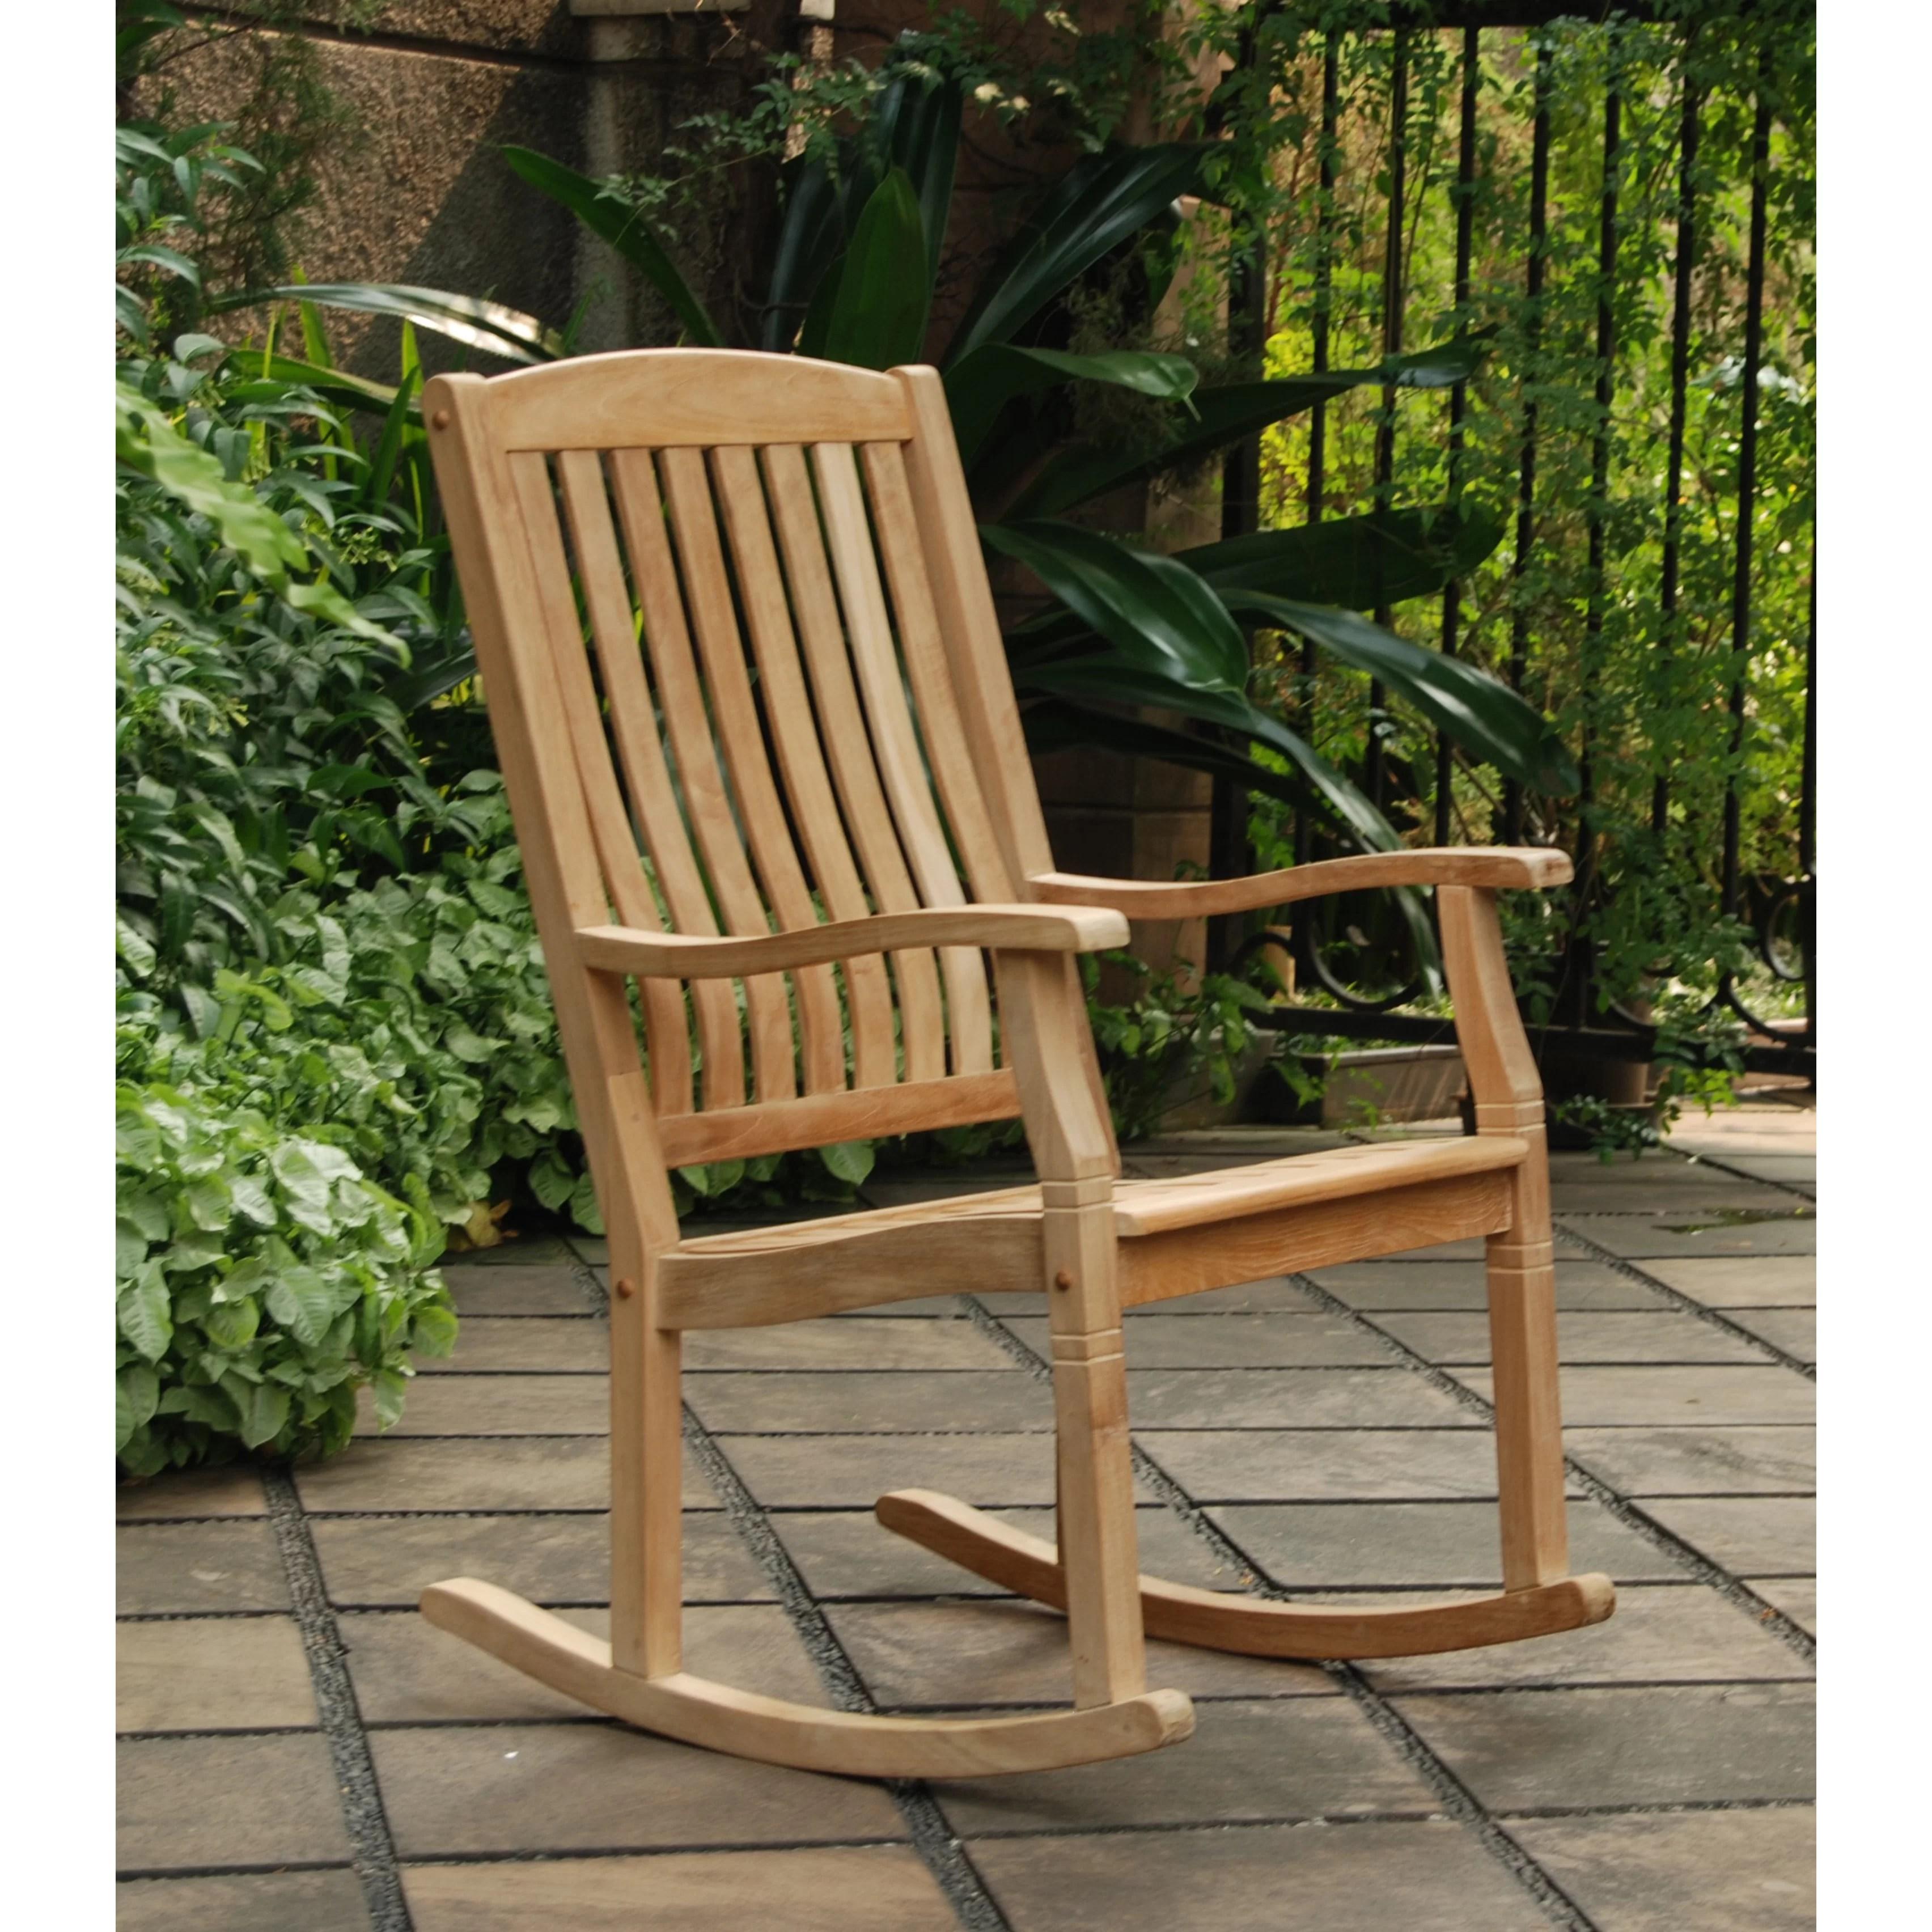 Crestwood Seymour Porch Rocking Chair & Reviews